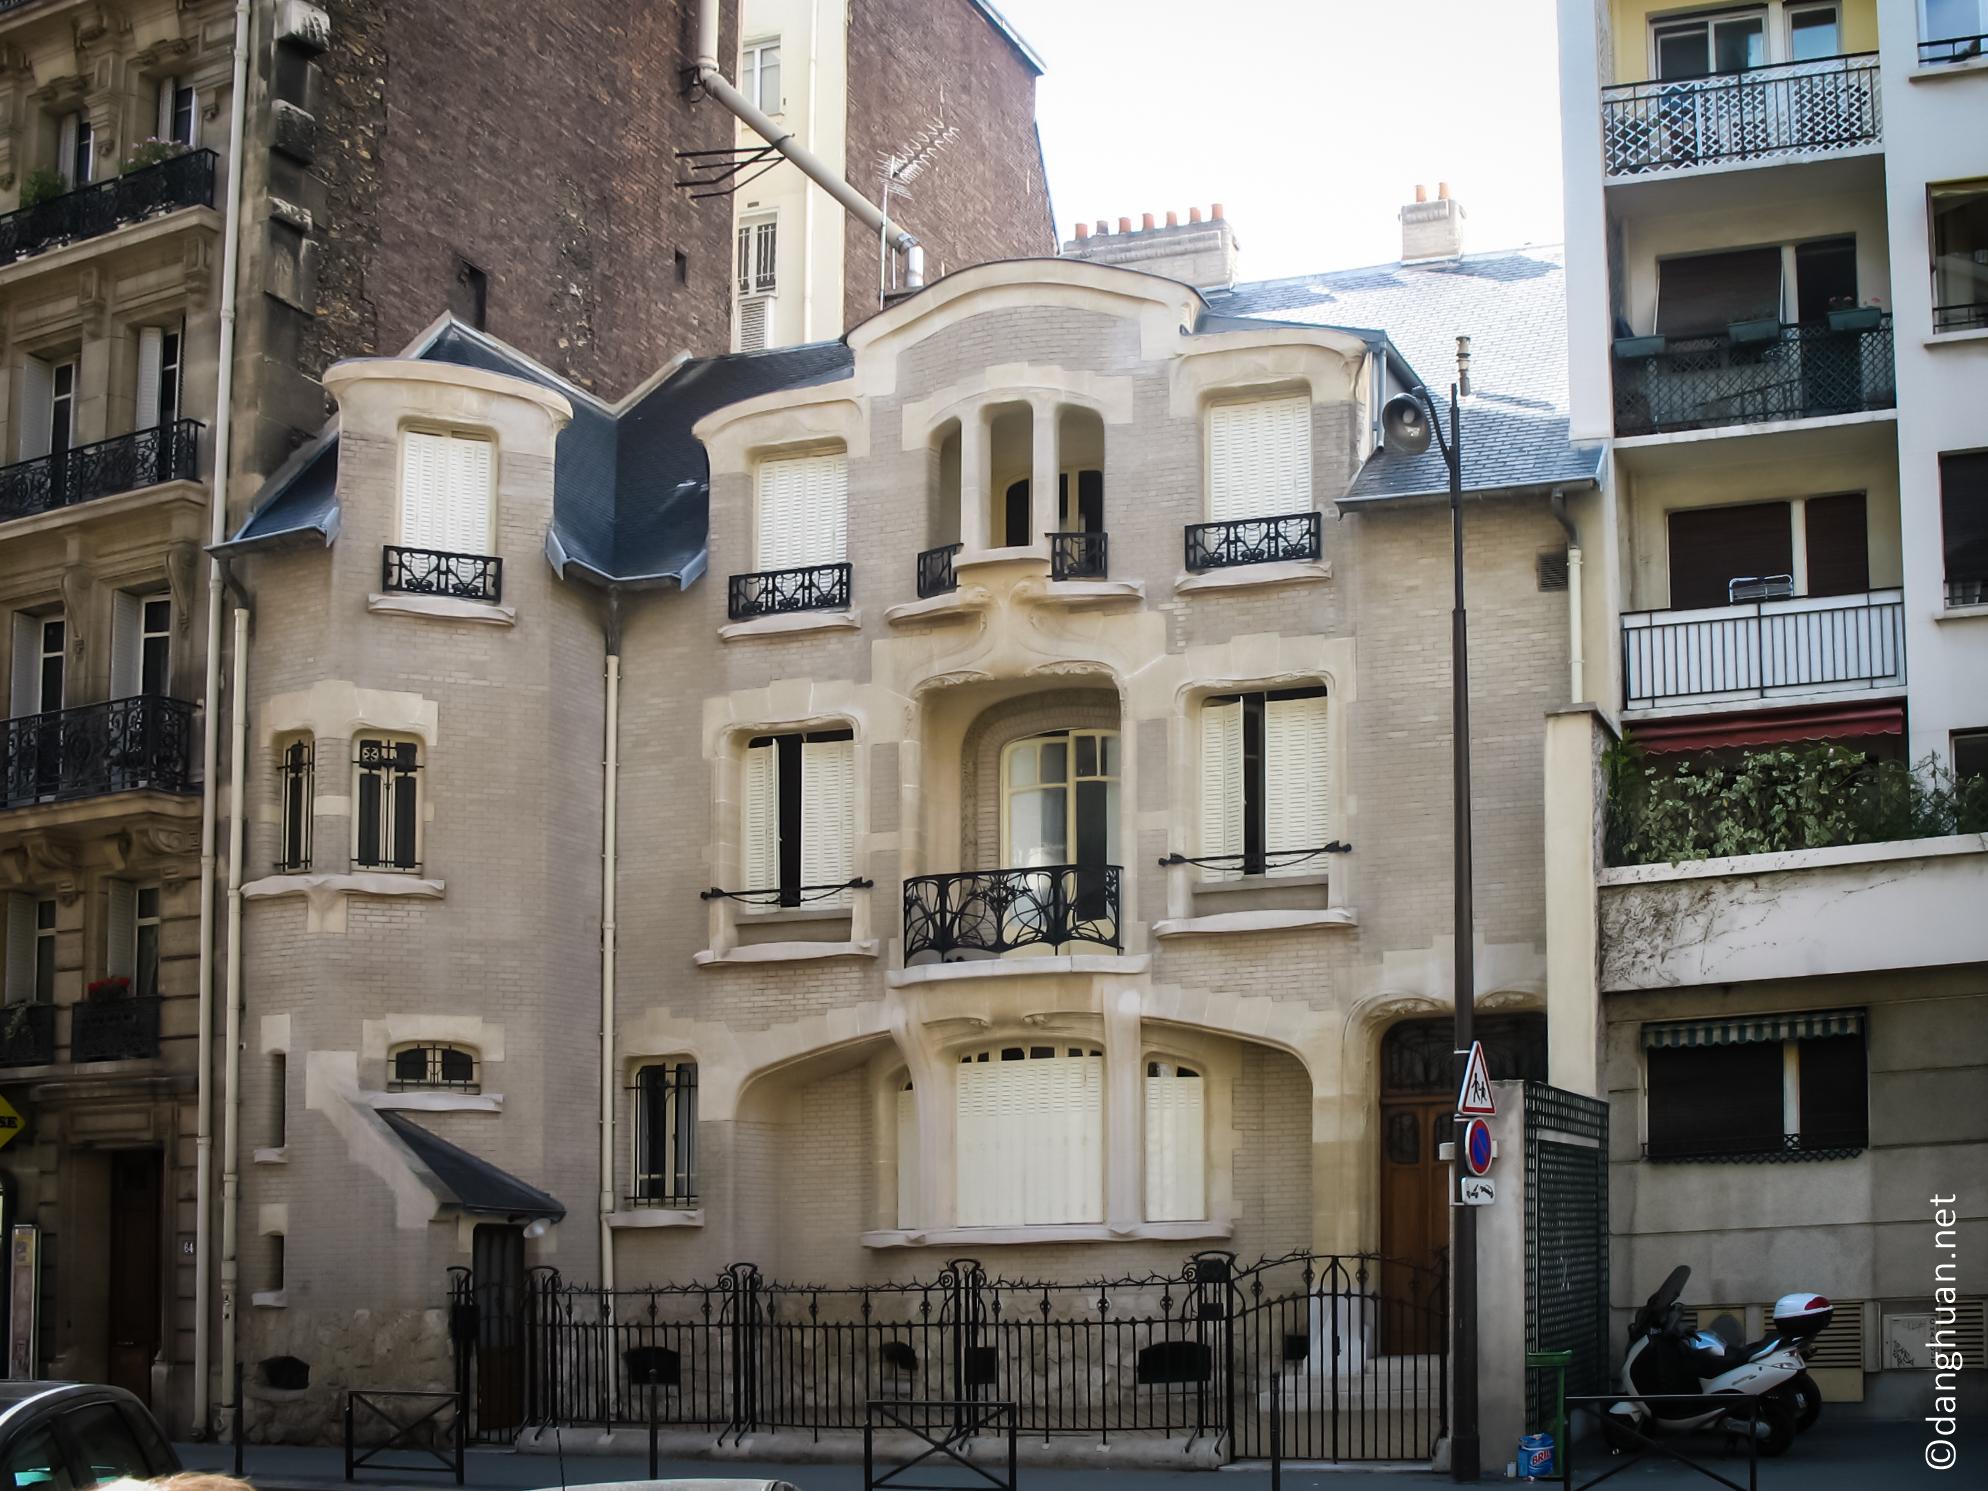 Architecte : Guimard - Hôtel Mezzara - 60 rue de la Fontaine - 1911